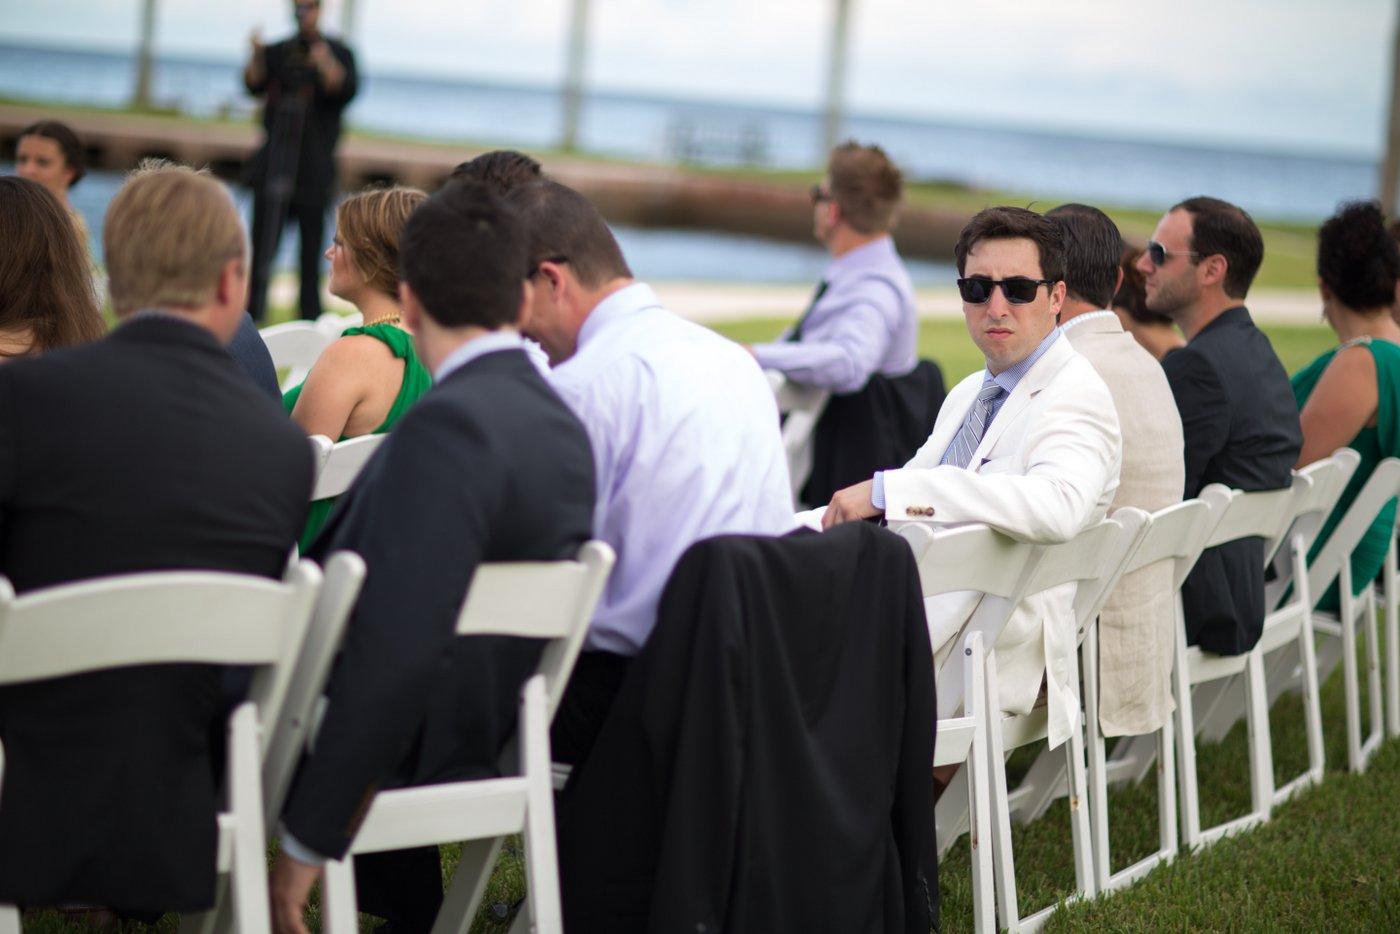 Deering Estate Wedding – Miami | Marisa + Daniel, Miami Wedding Photographers | Häring Photography, Indian Wedding Photographer in Florida, Best Muslim, Hindu - South East Asian Wedding Photographers